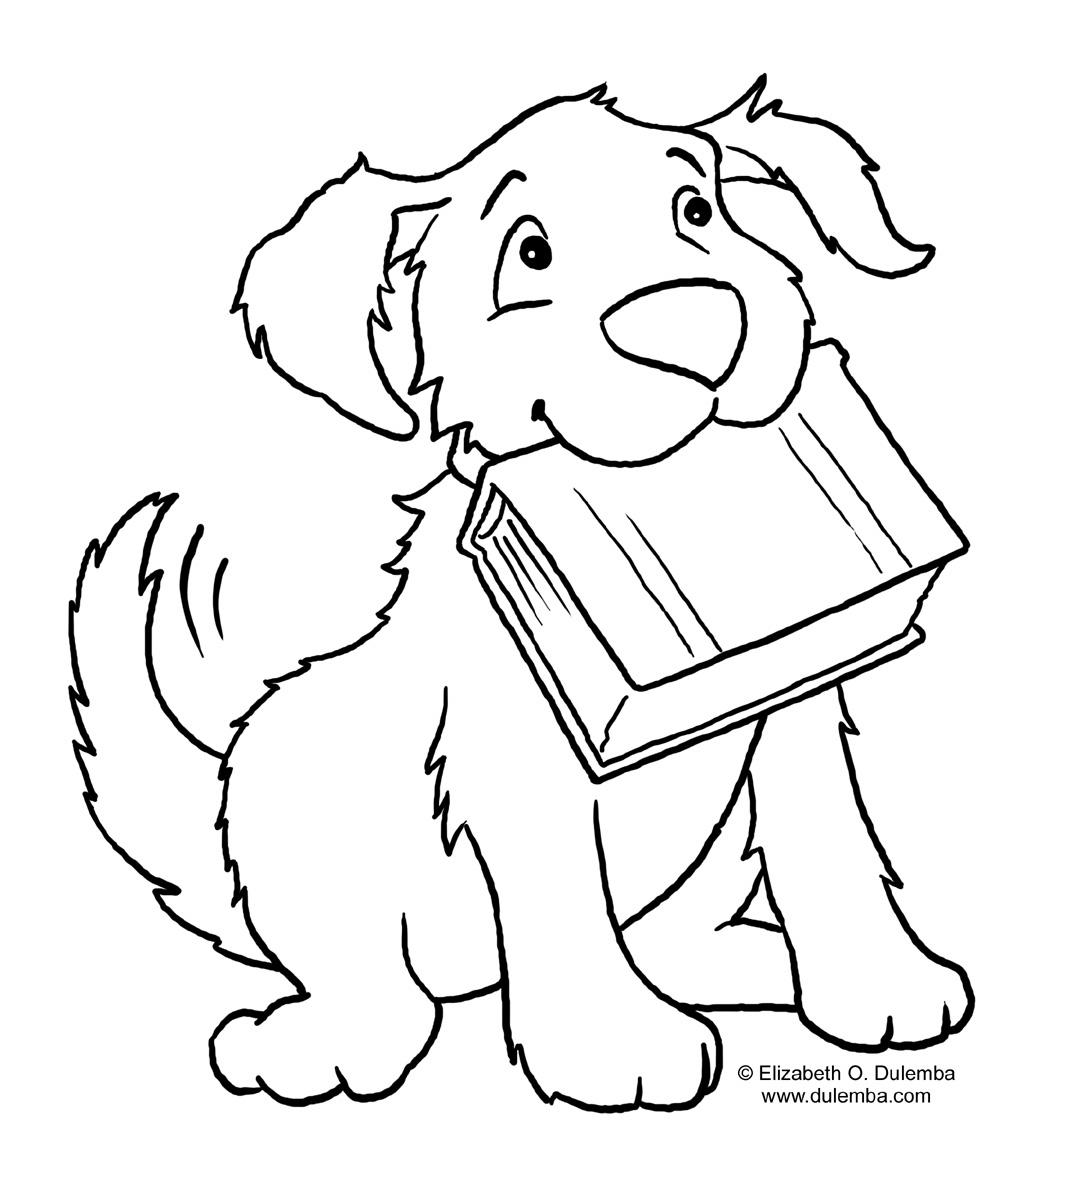 best coloring page dog  september 2012